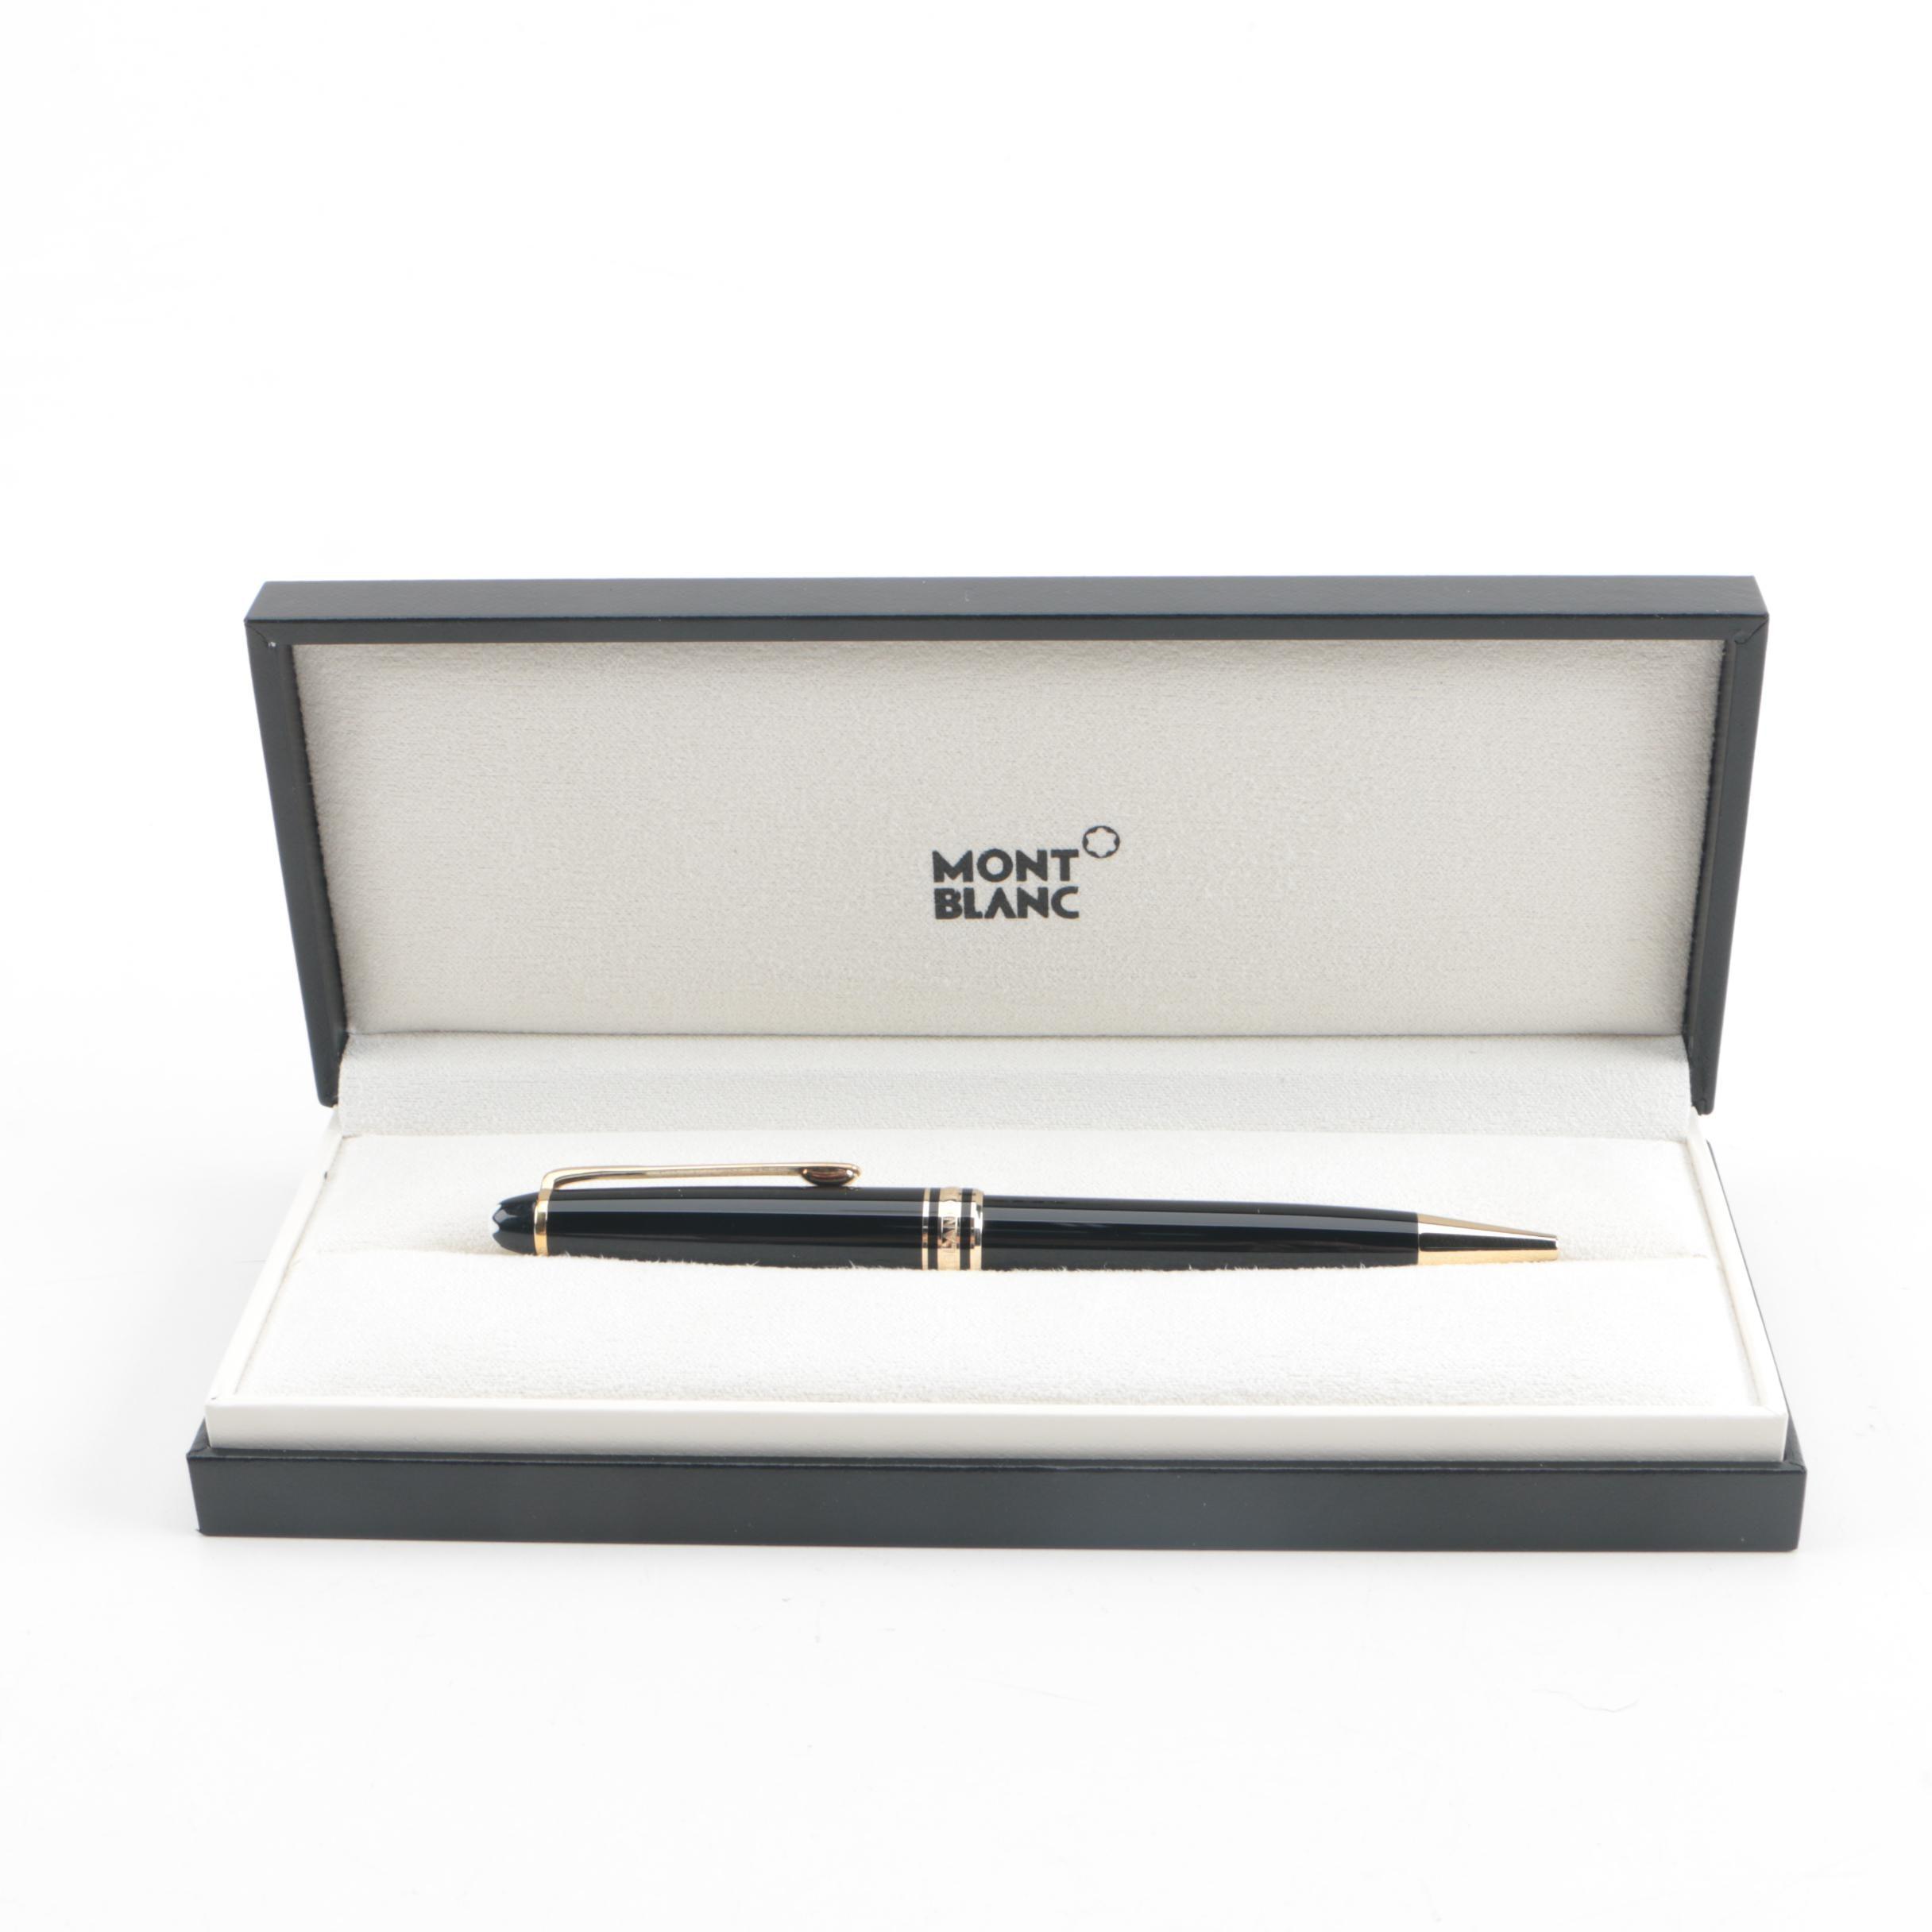 Montblanc Meisterstück Ballpoint Pen